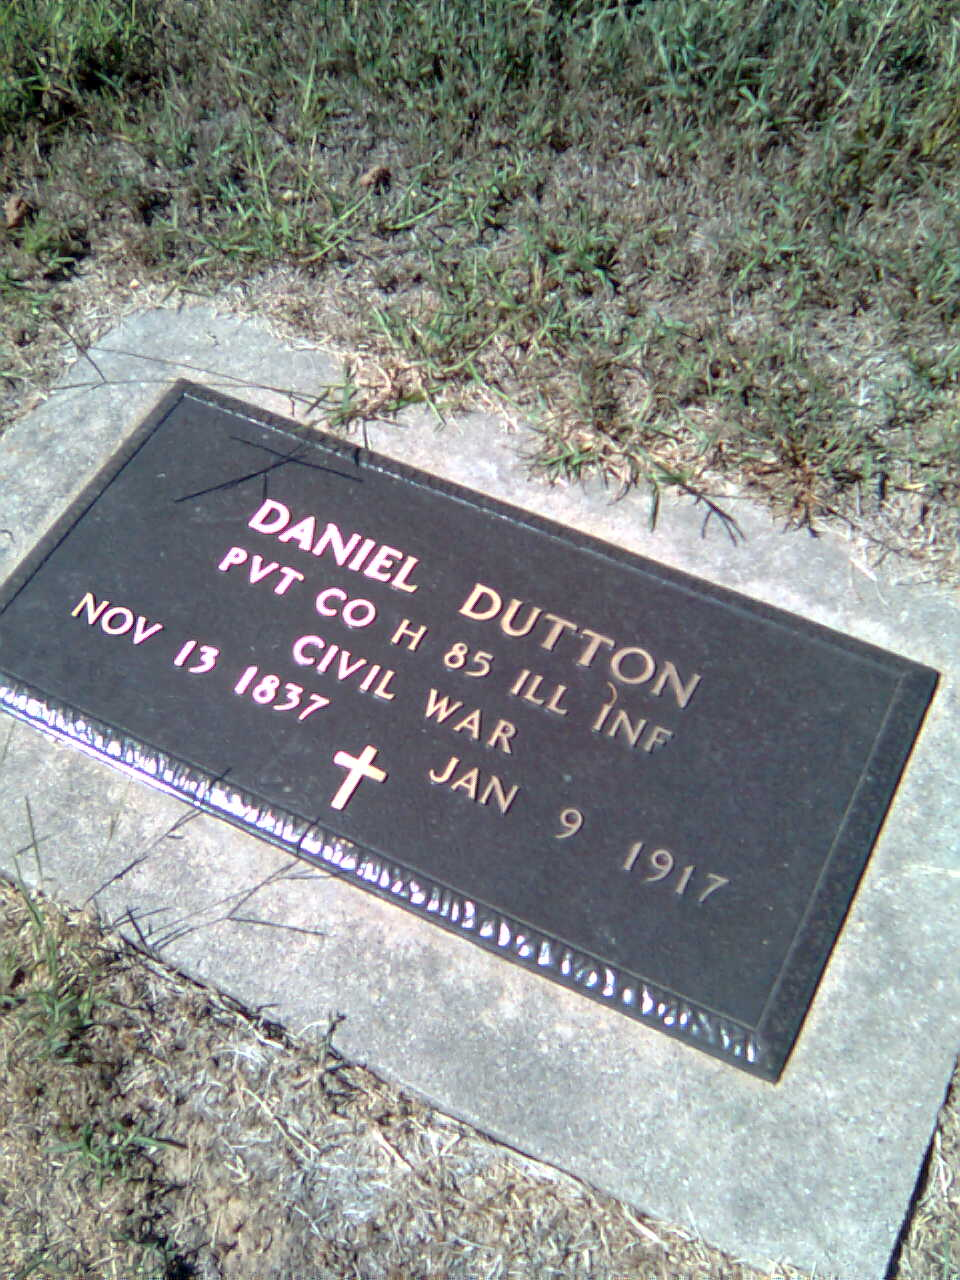 Daniel Dutton